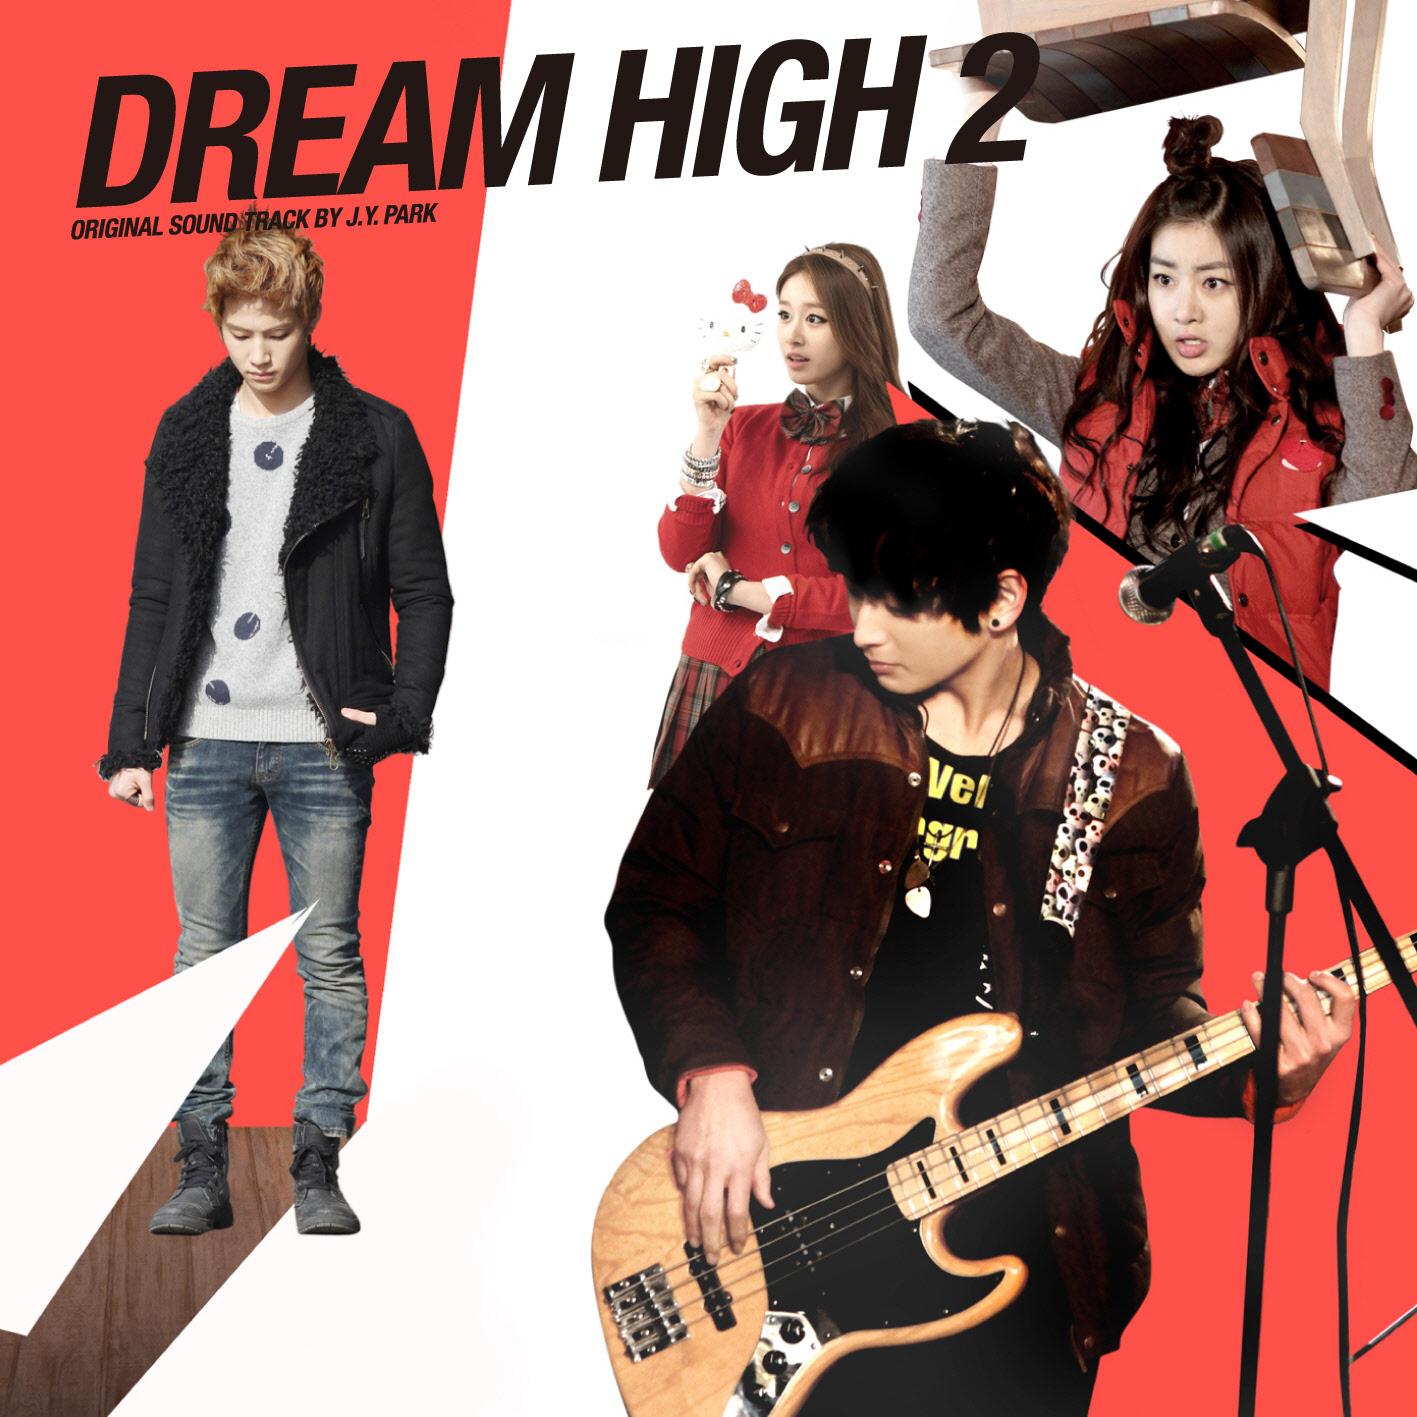 http://1.bp.blogspot.com/--xs8xHyN7p0/T3H9KCnEpiI/AAAAAAAABsw/YZdaUDJGD10/s1600/Dream+High+2.jpg